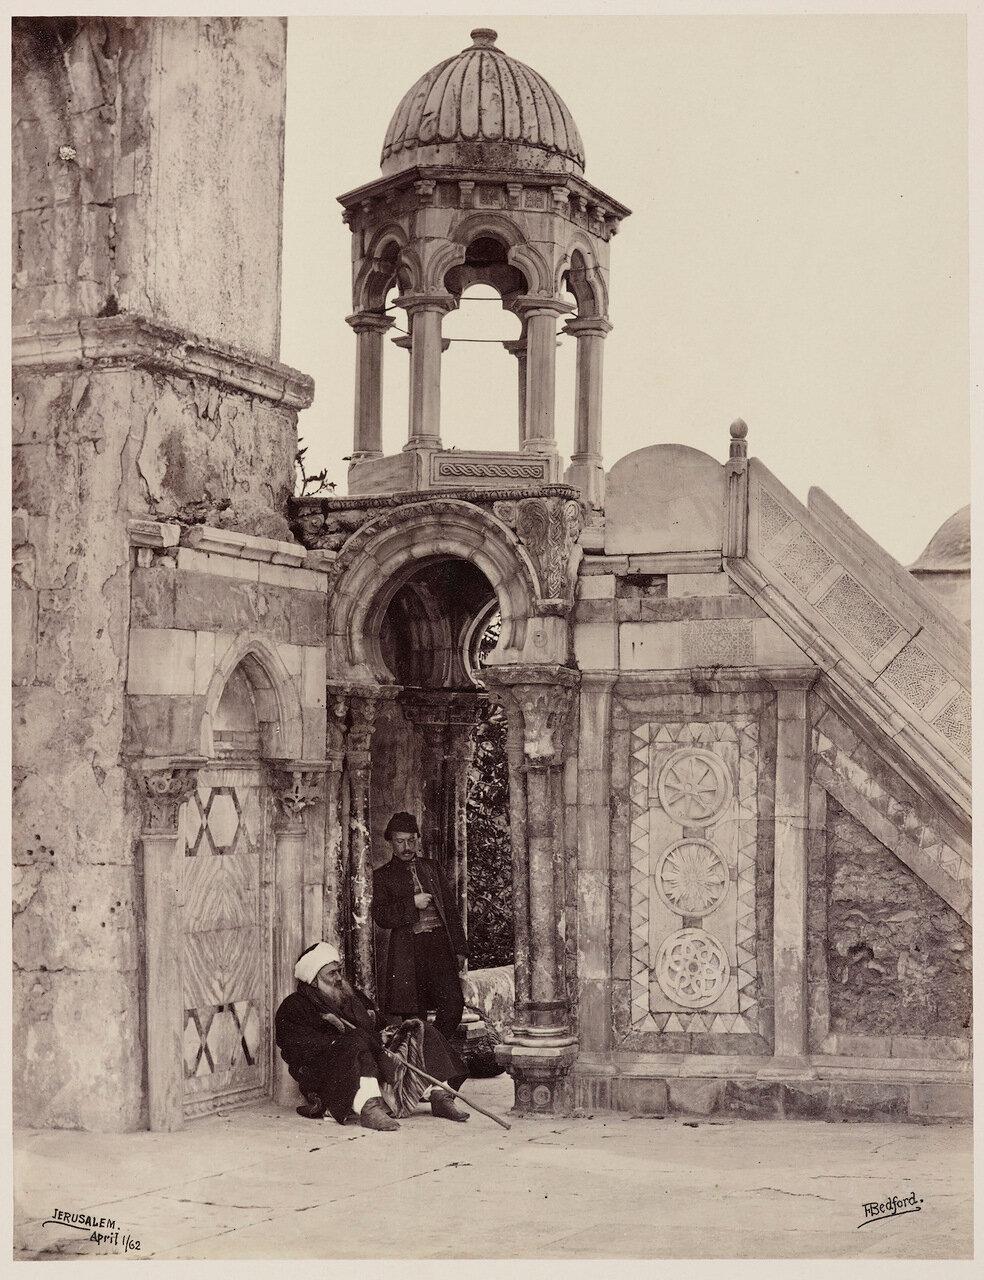 1 апреля 1862. Мечеть Купол Скалы, Иерусалим